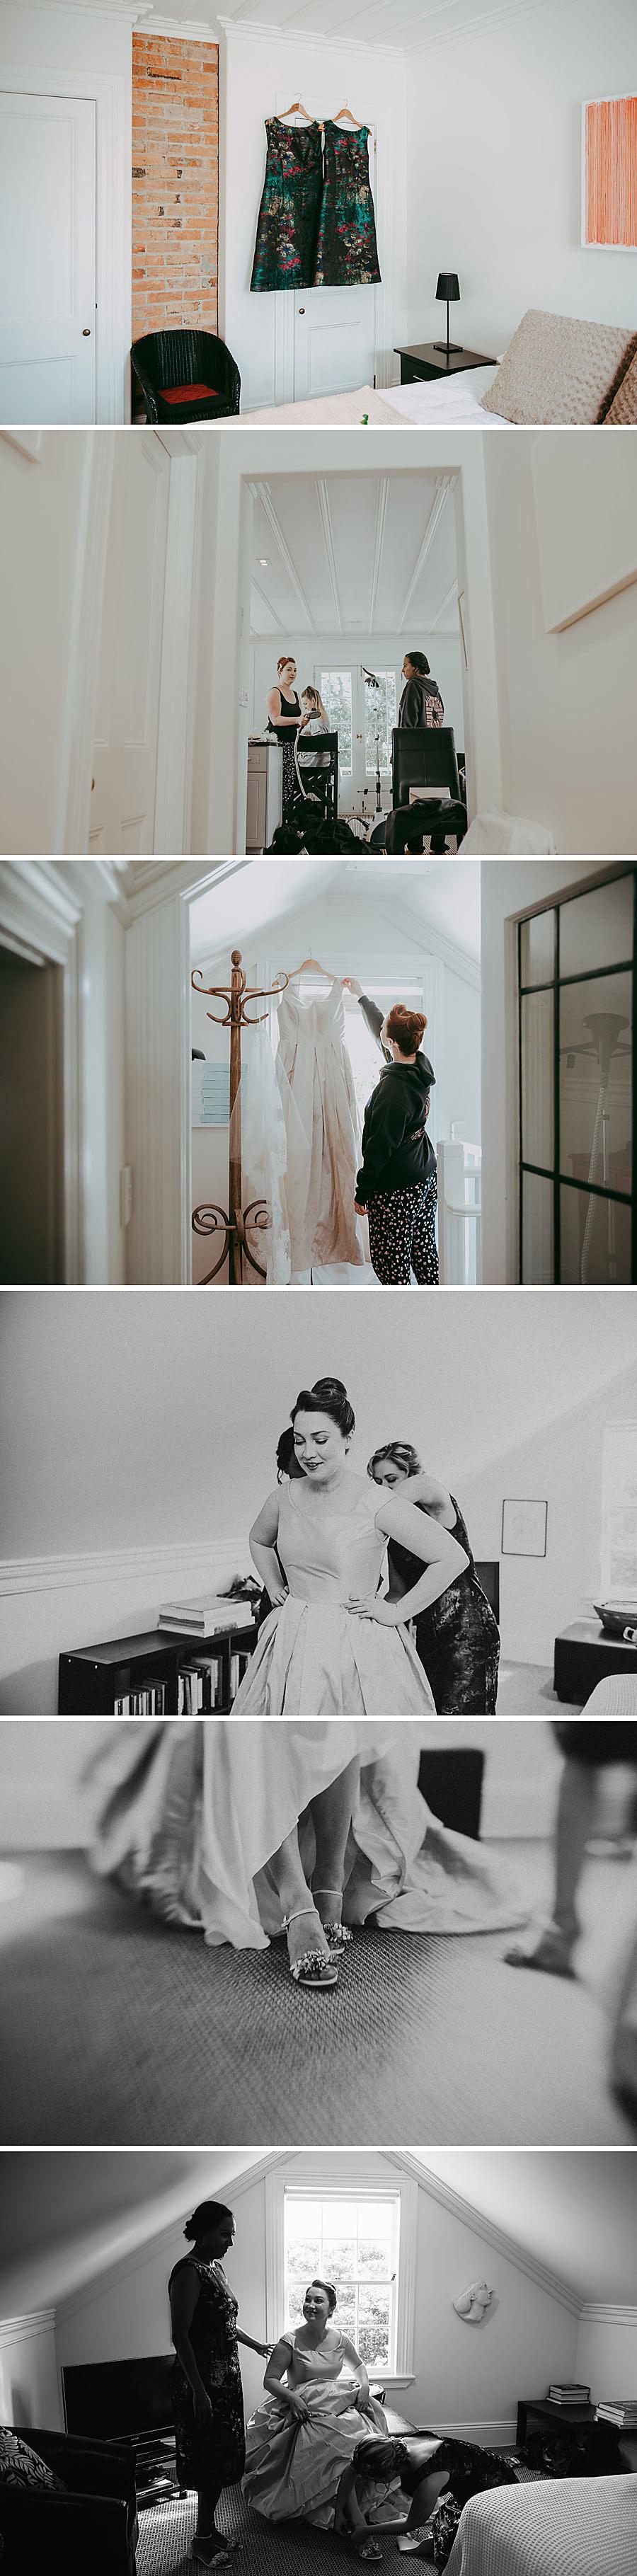 Russell Wedding Photographer Jess Burges